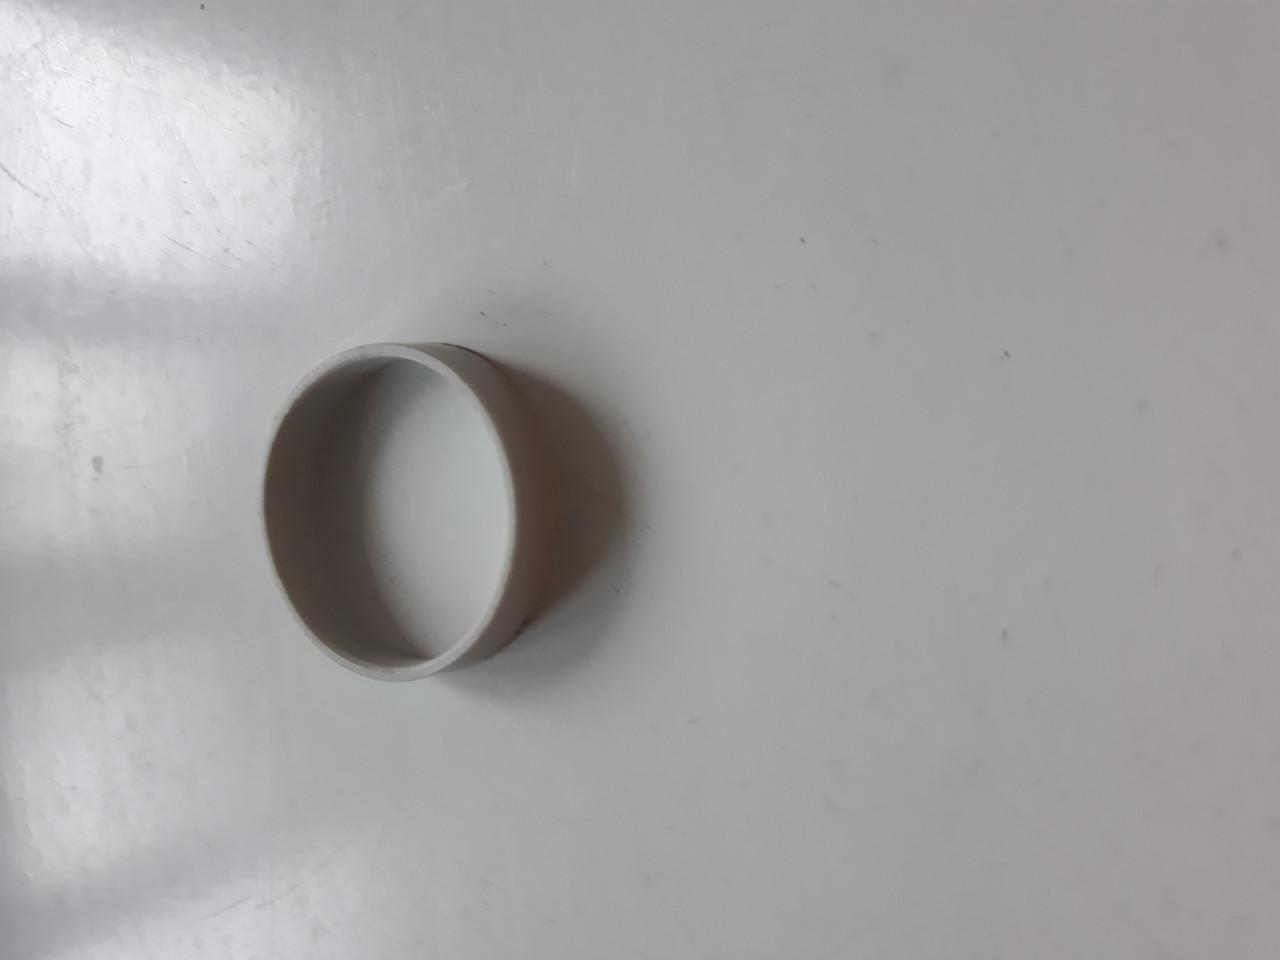 Кольцо патрубка для бензопилы STIHL 170,180 оригинал